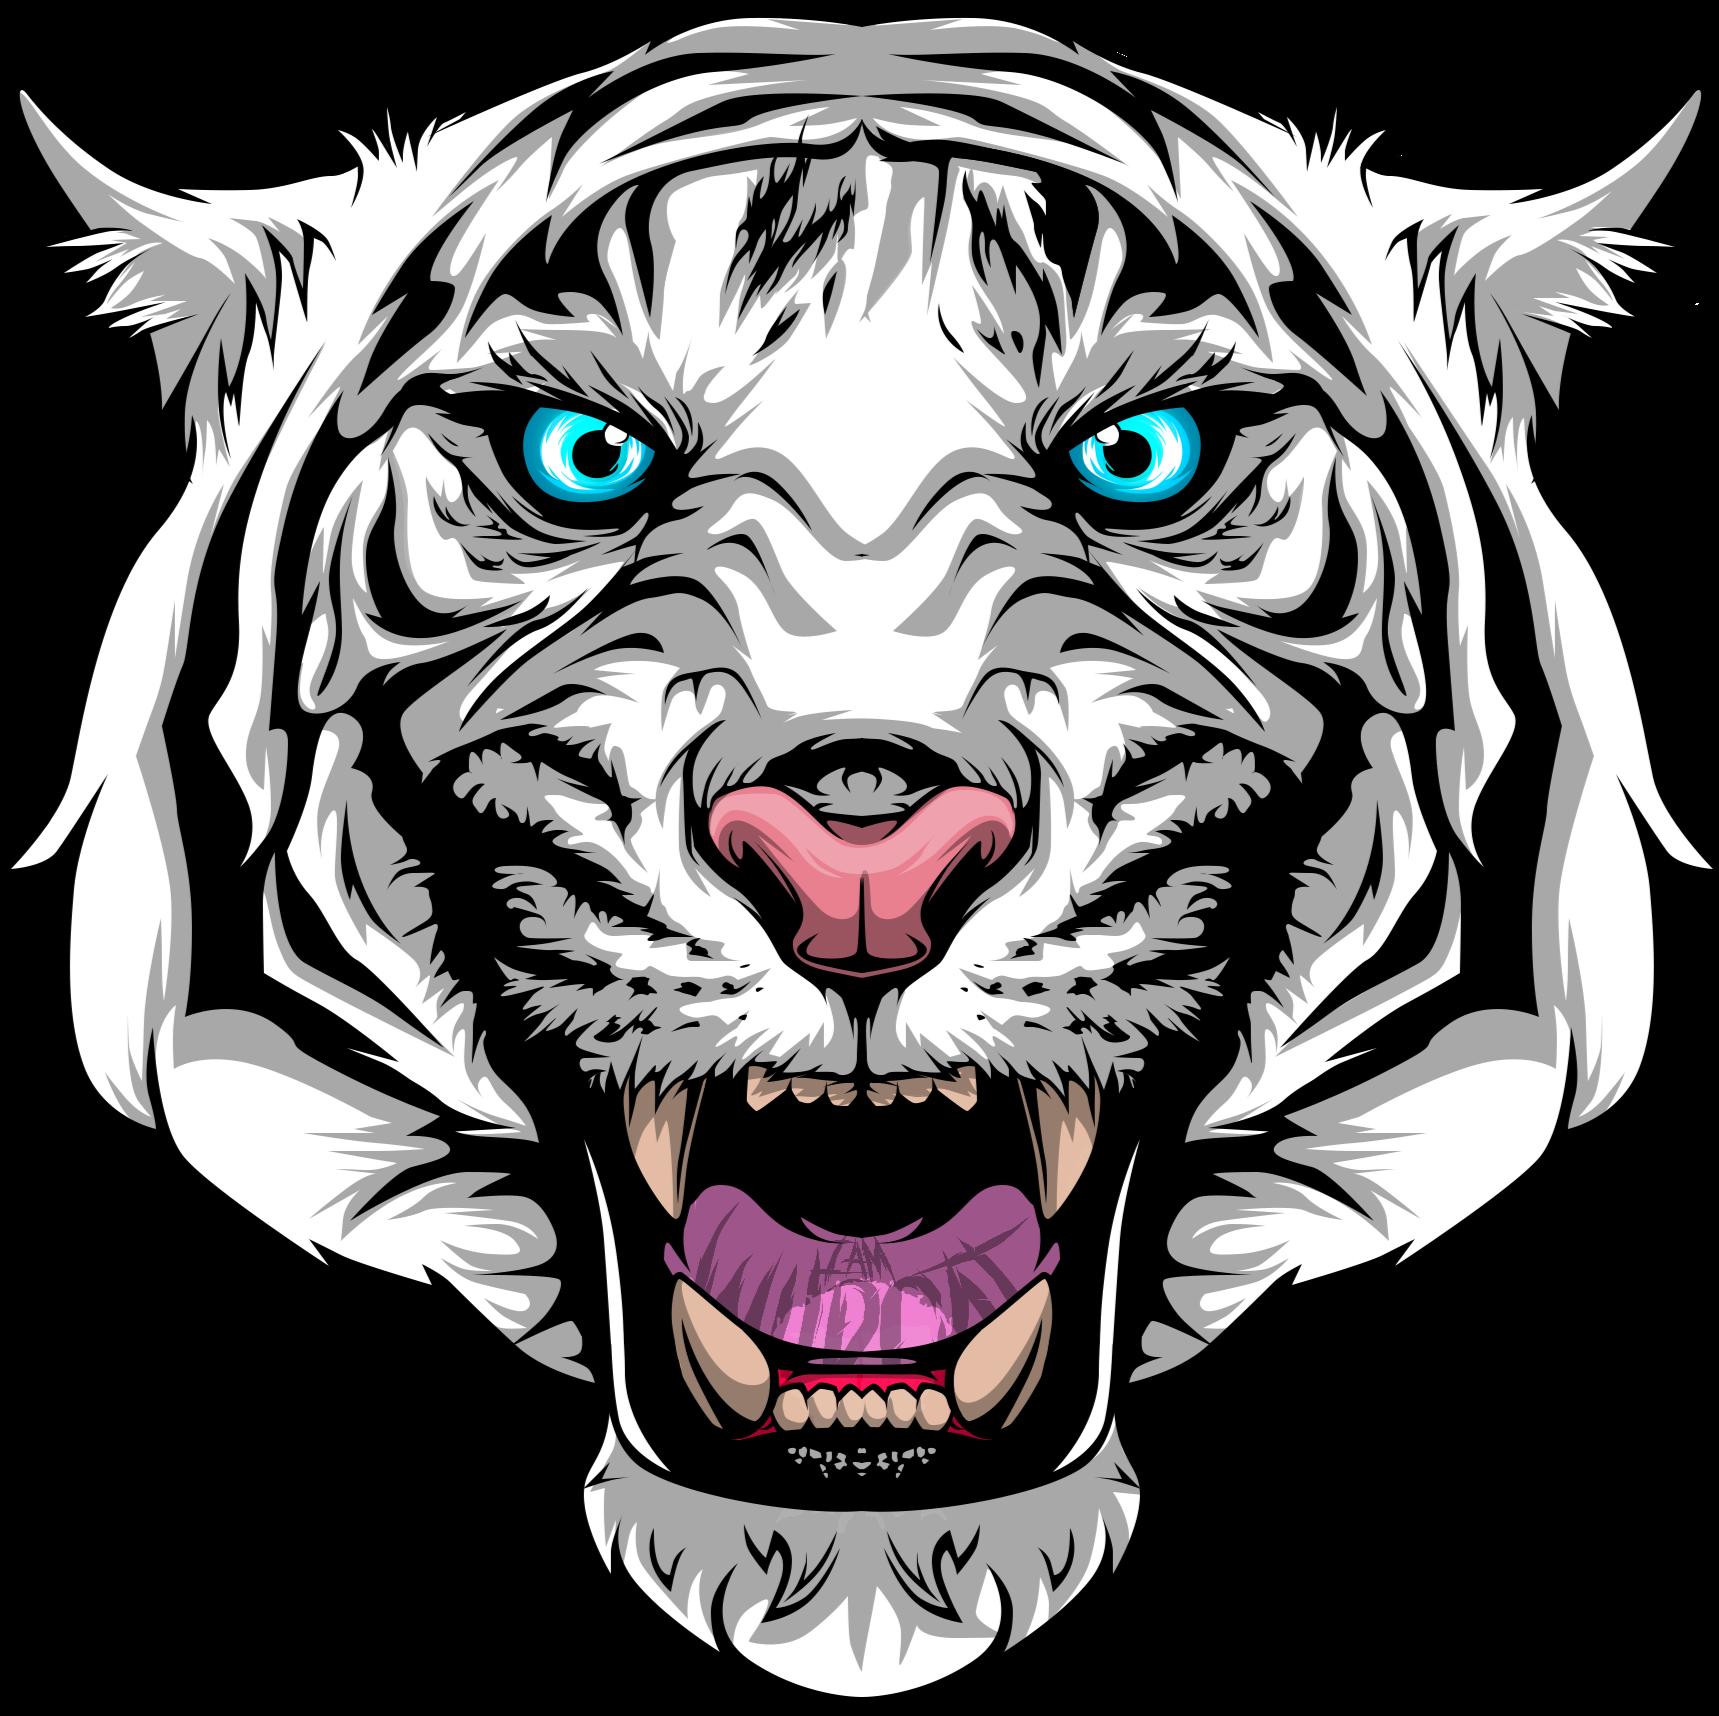 Image i am logo. Wildcat clipart file